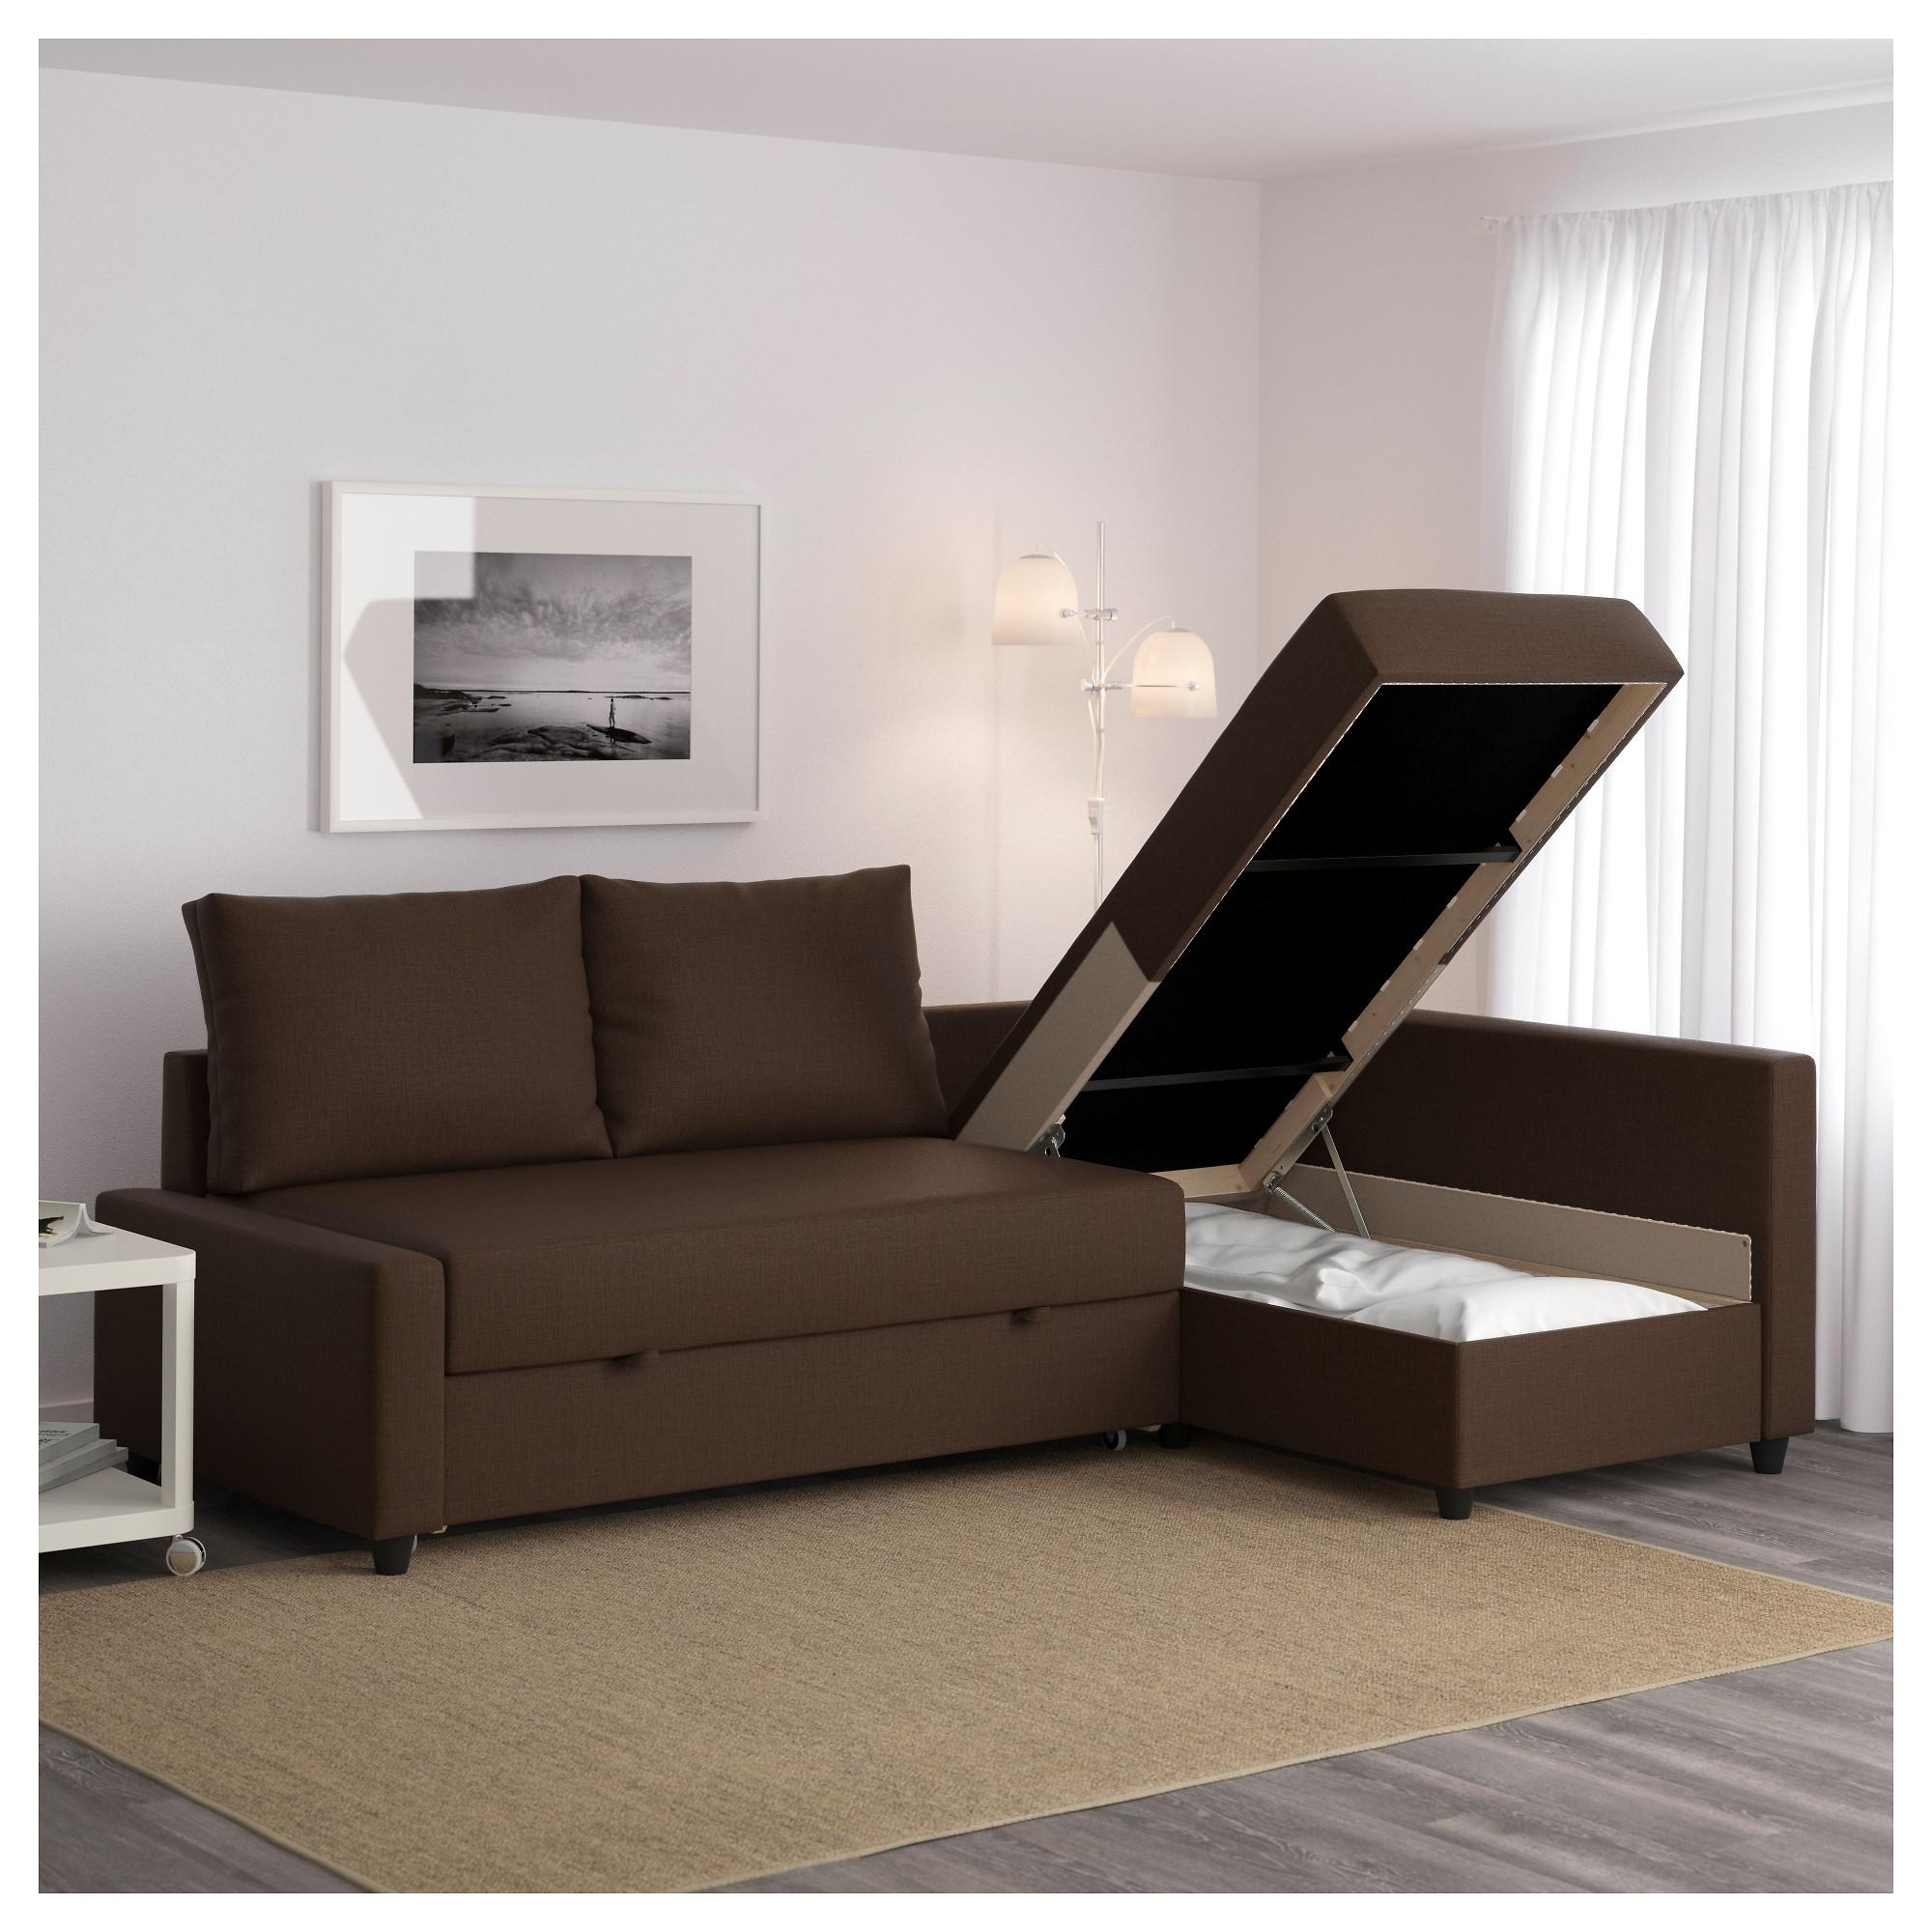 Latest Friheten Corner Sofa Bed With Storage Skiftebo Brown – Ikea Pertaining To Ikea Corner Sofas With Storage (View 9 of 15)